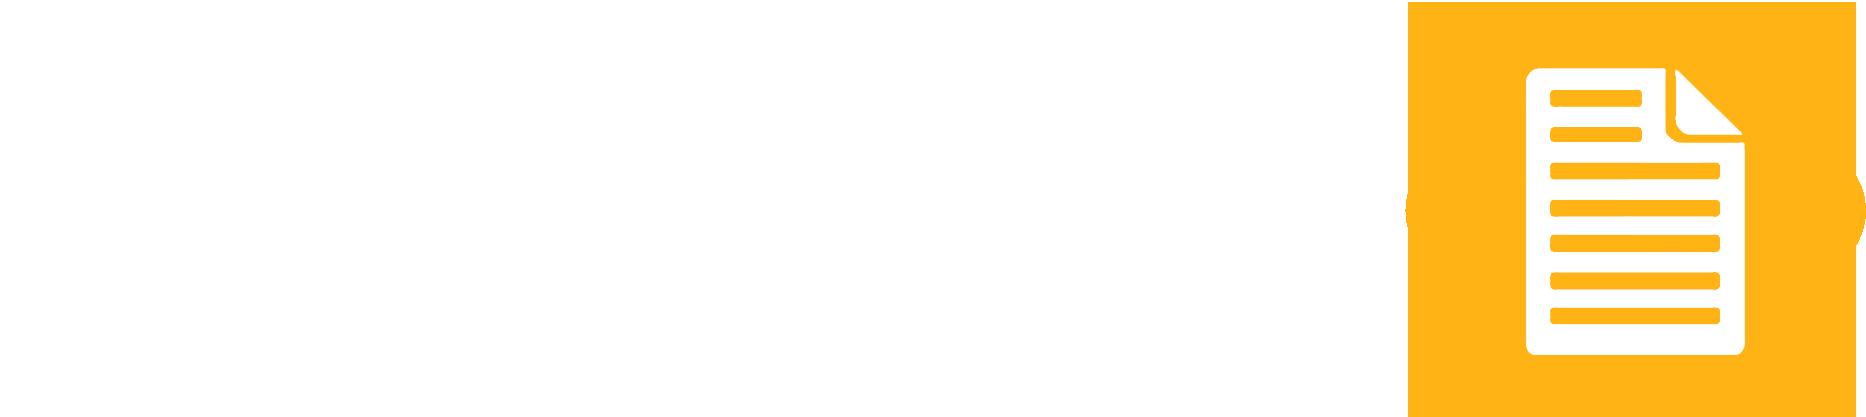 Docuro logo